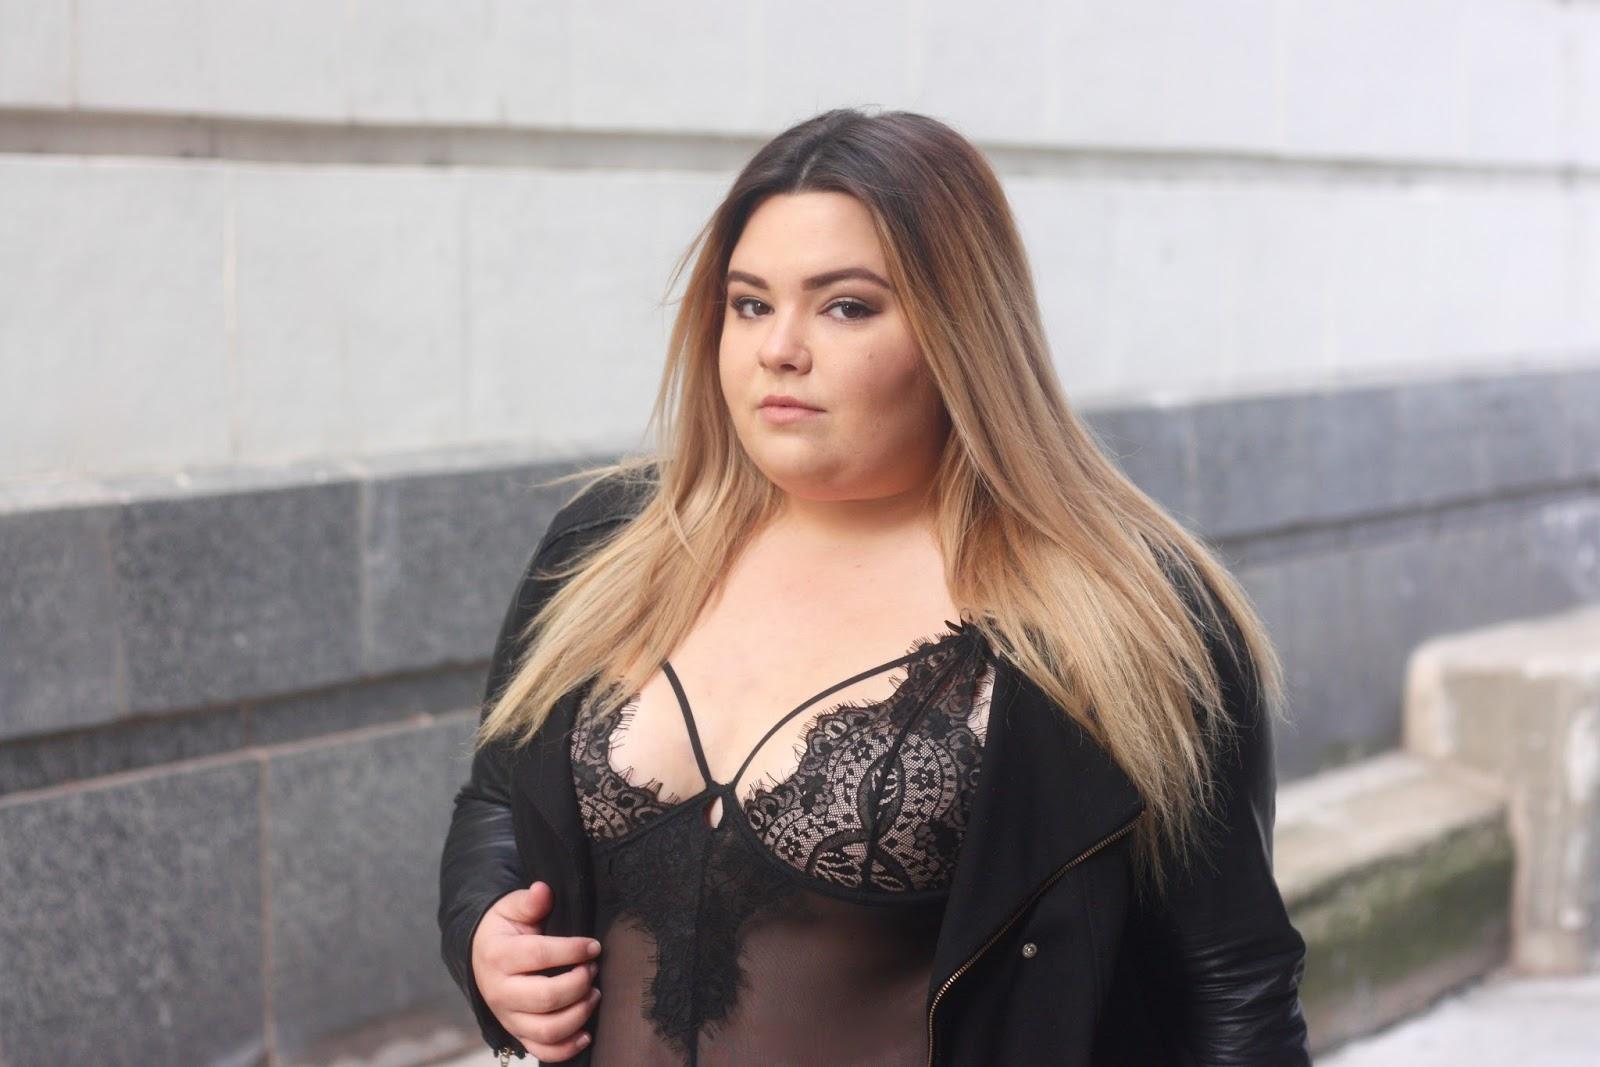 lingerie, street style, leather jacket, plus size fashion, natalie craig, natalie in the city, khloe kardashian, good american, fatshion, embrace your curves, curvy, what fat girls actually wear, chicago fashion blogger, lace bodysuit, midwest blogger, plus size lingerie